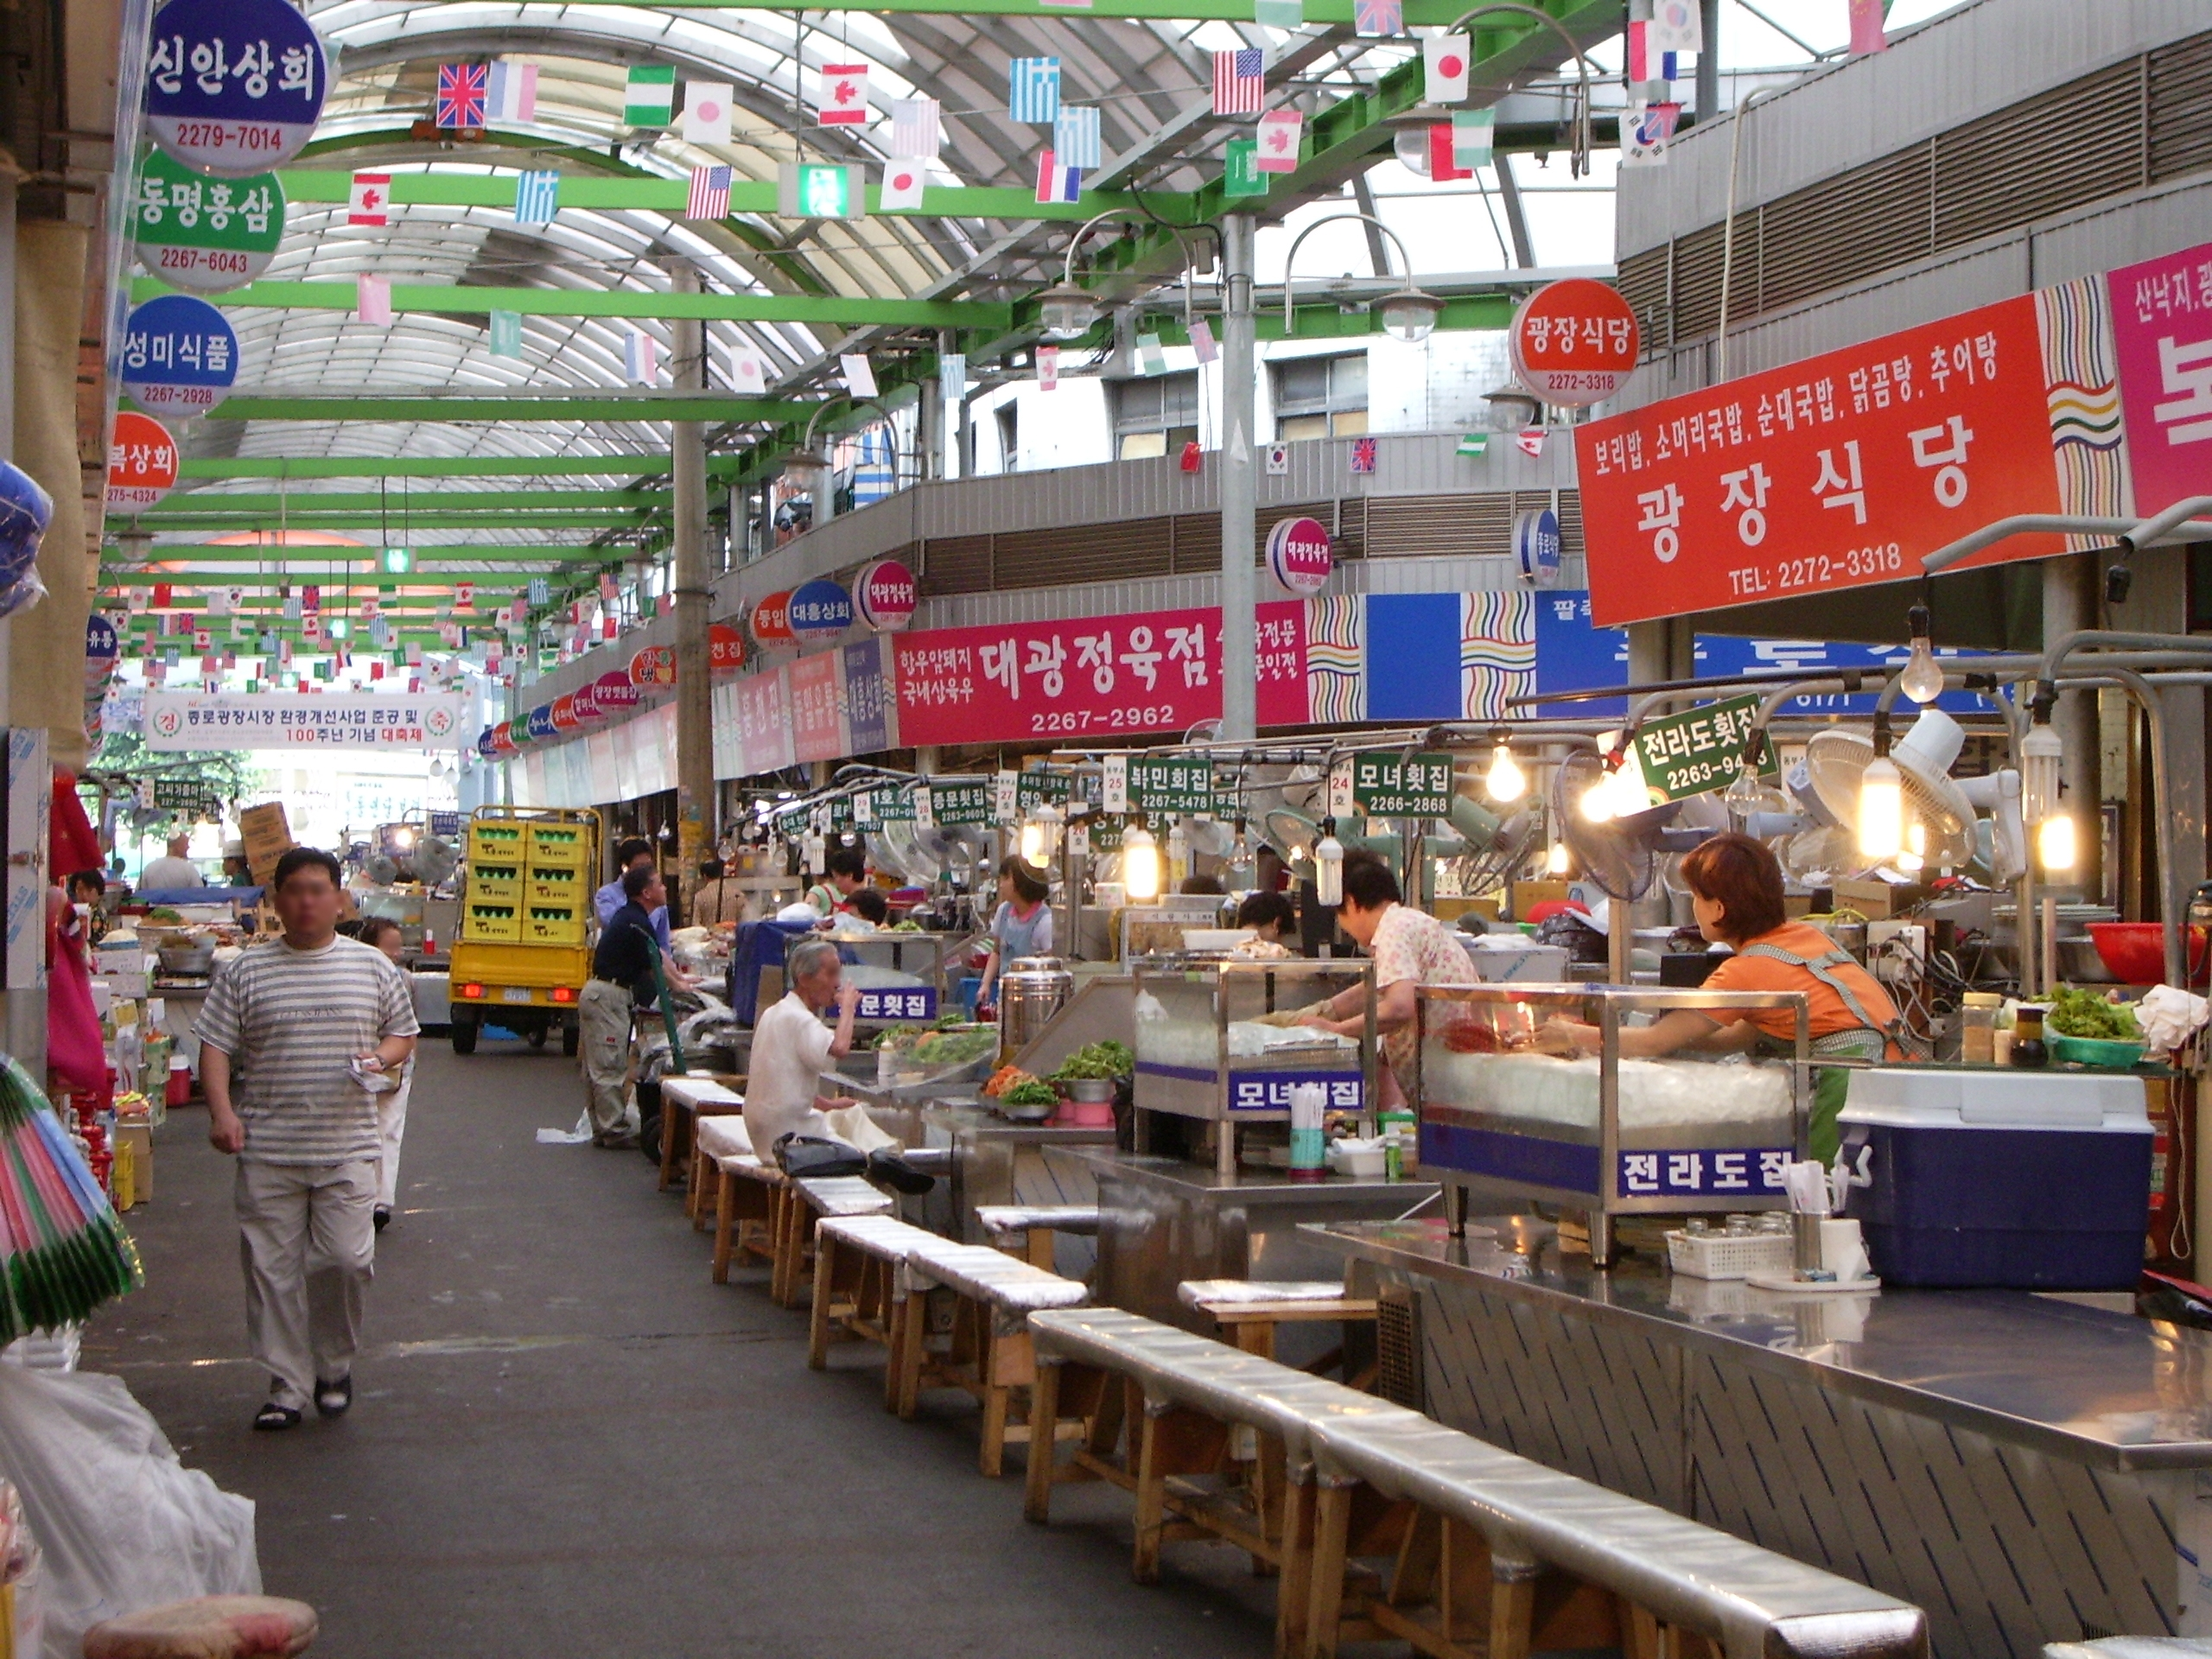 Korean Food Market Orlando Fl